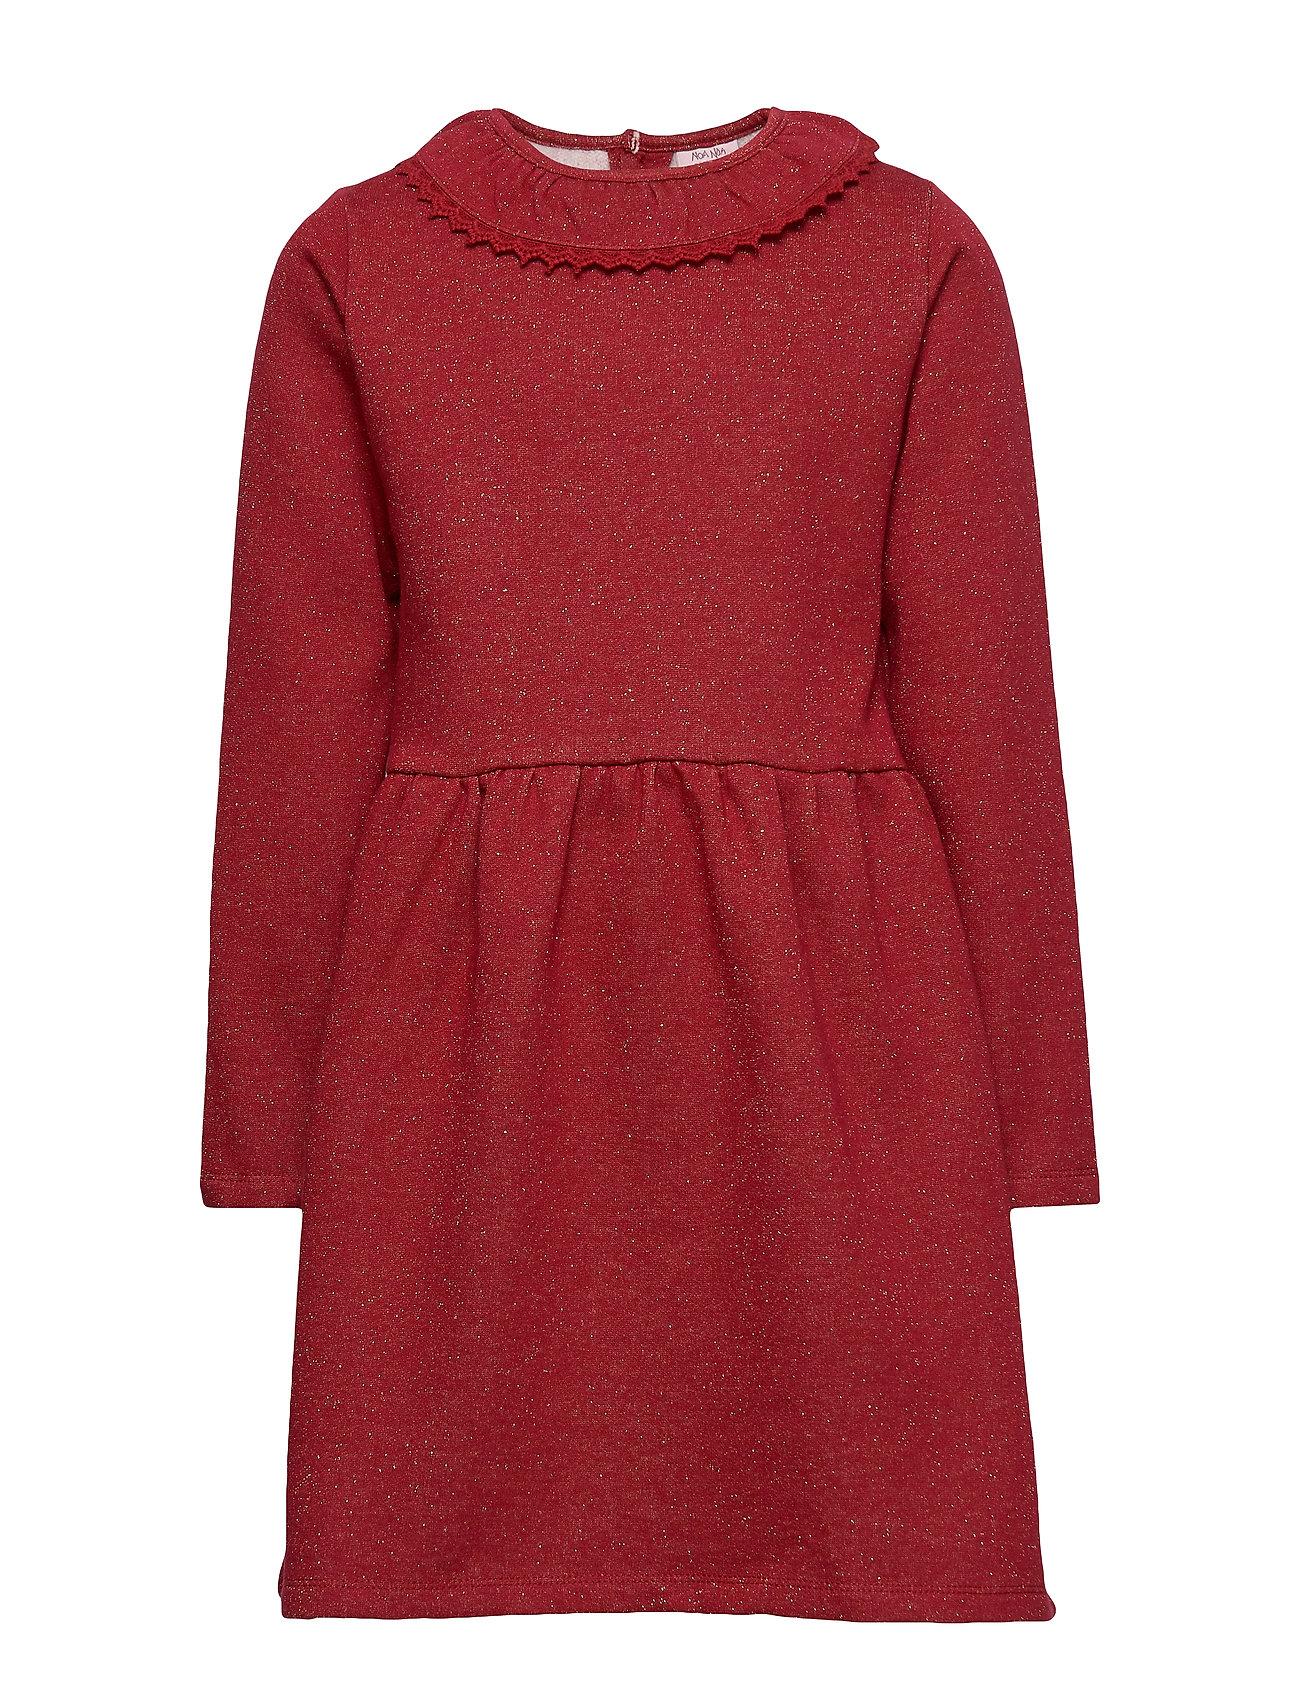 Noa Noa Miniature Dress long sleeve - RED DAHLIA